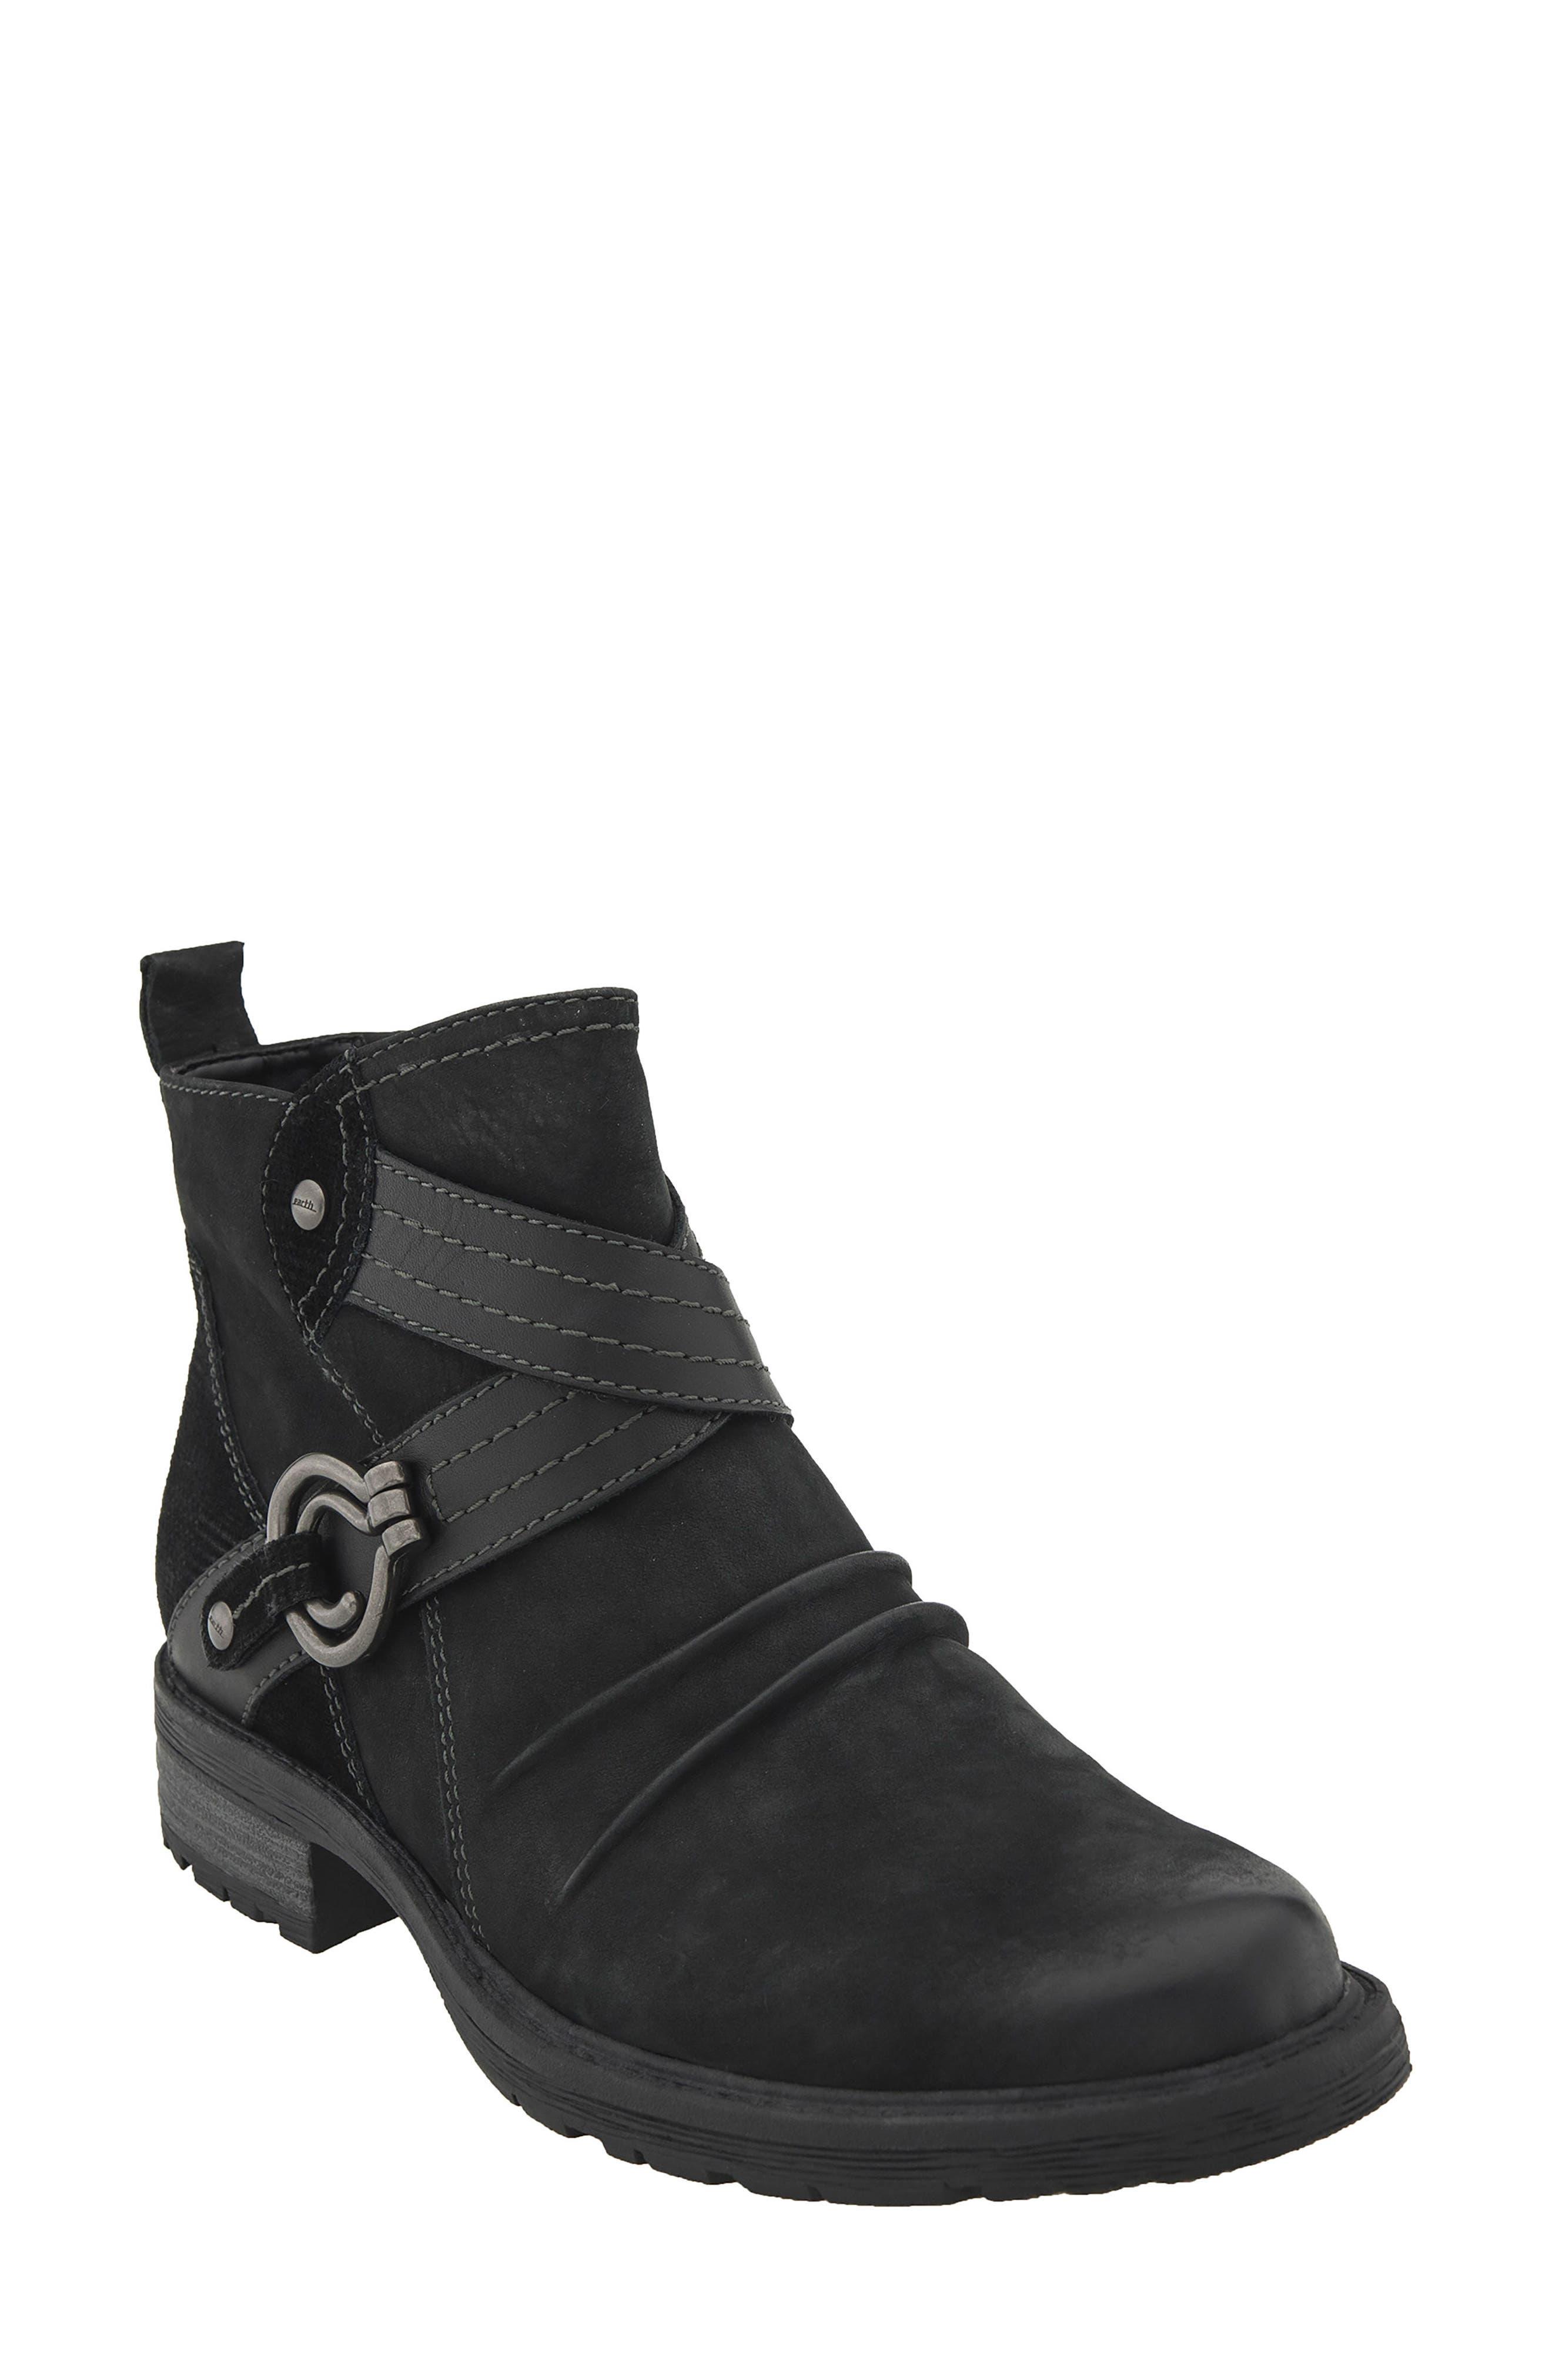 Laurel Boot,                             Main thumbnail 1, color,                             014